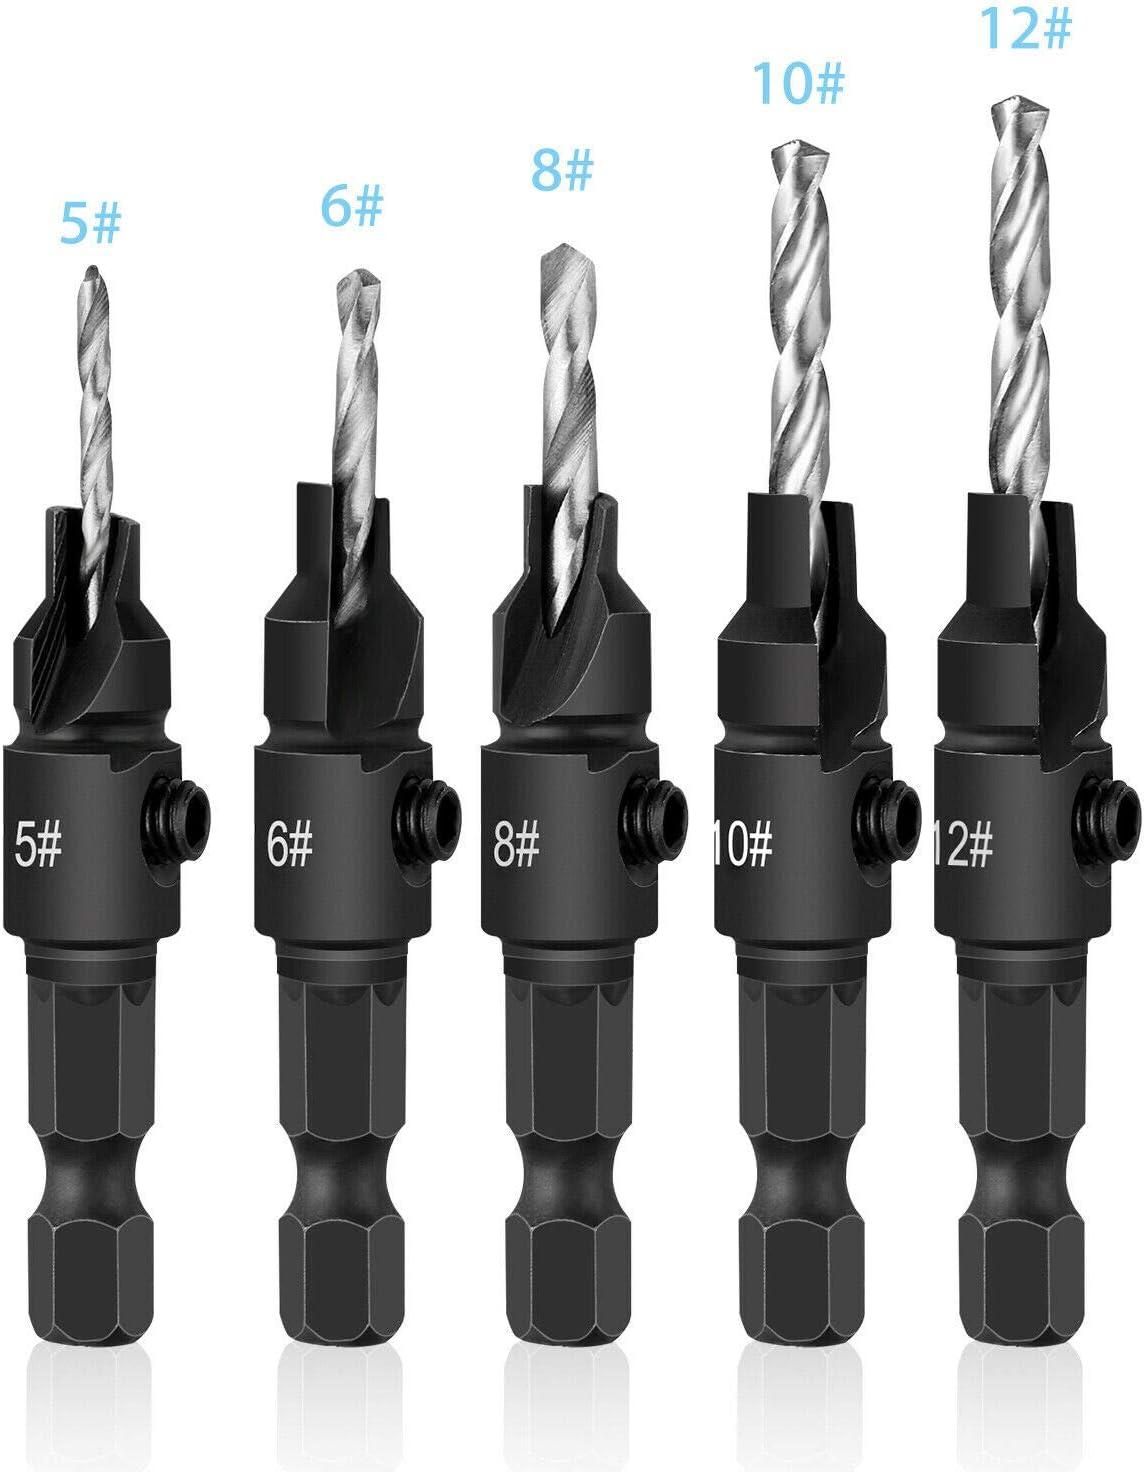 TJP 5PCS HSS Countersink Drill Bit Set Screw Woodworking Chamfer Tool Quick Change